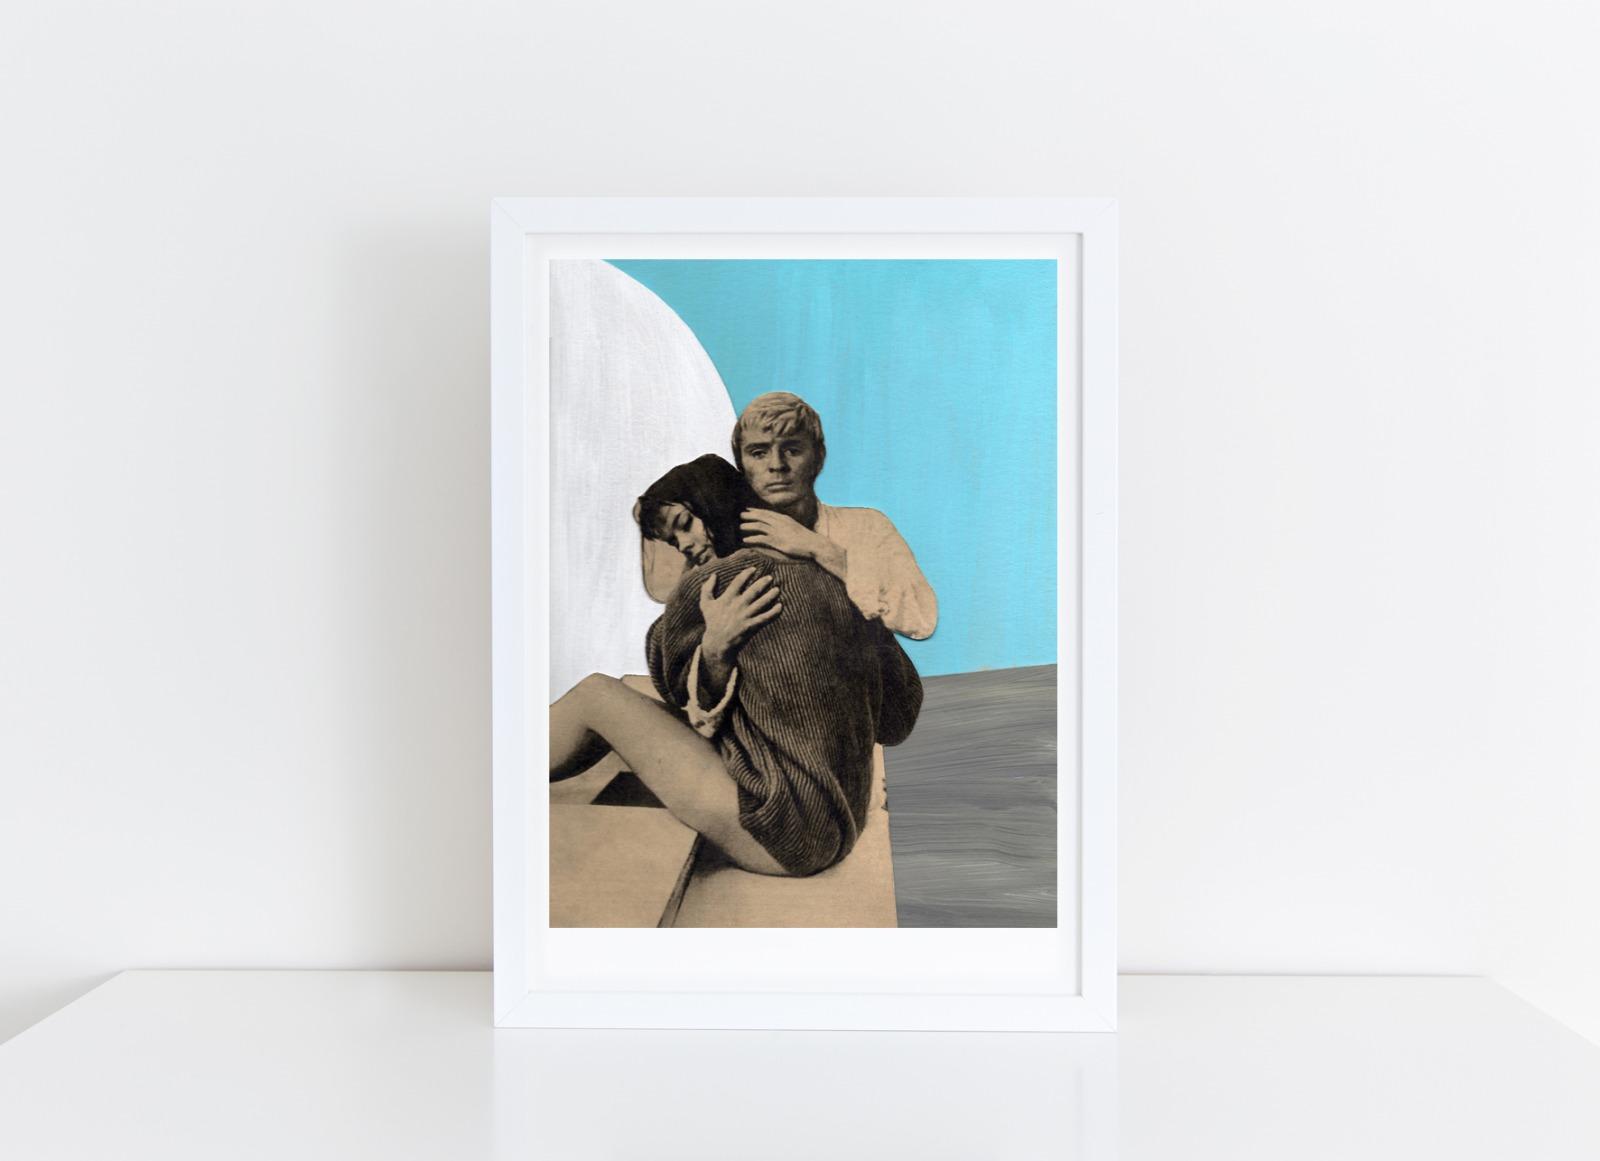 Der Retter Collage Poster Kunstdruck A4